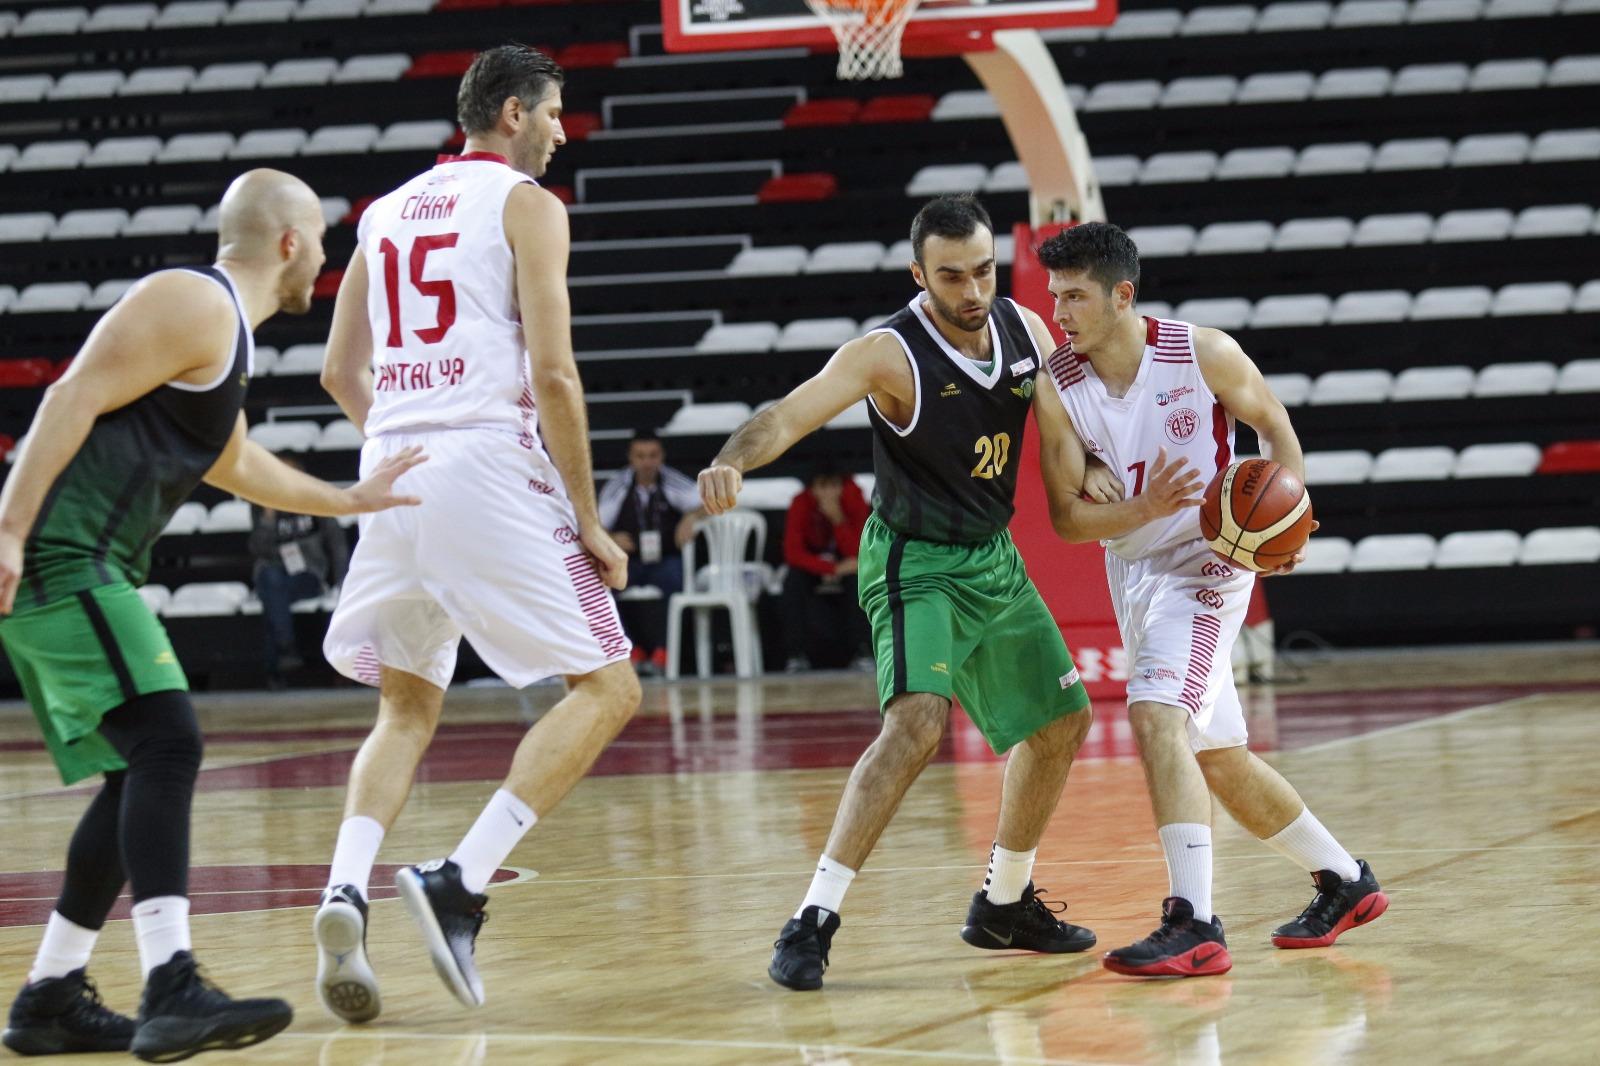 Antalyaspor 81 – 55 Akhisar Belediyespor